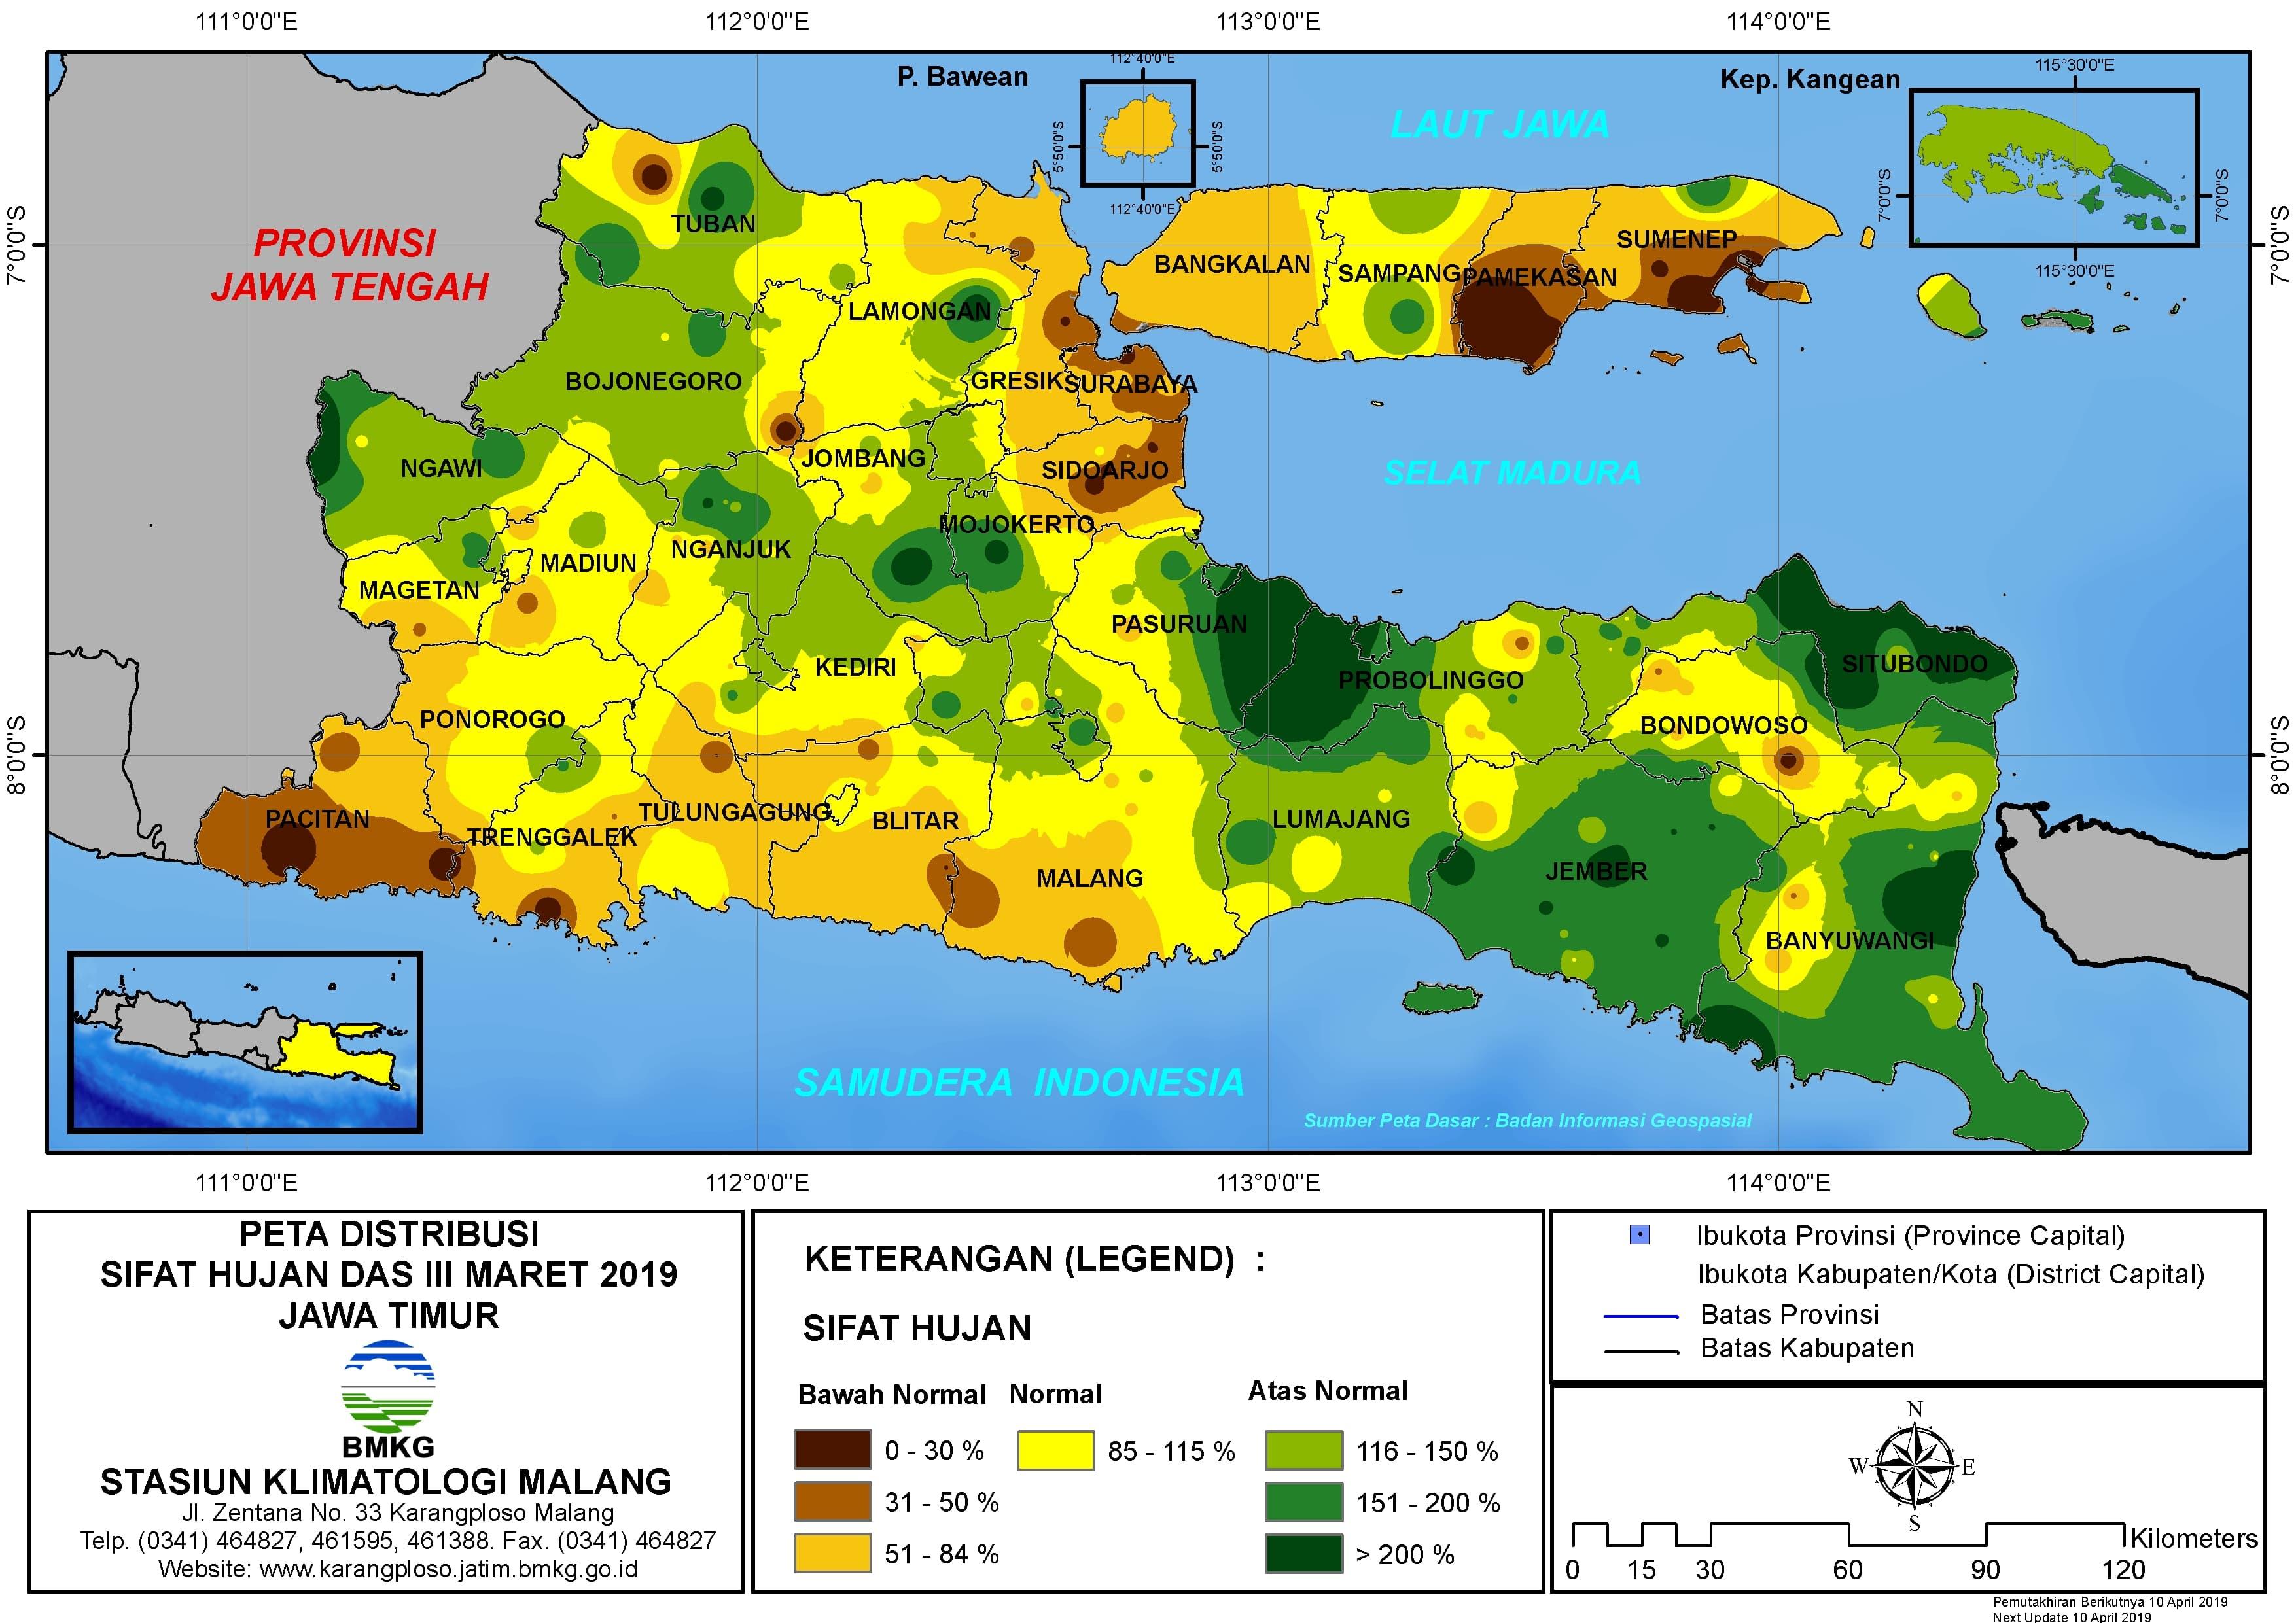 Peta Analisis Distribusi Sifat Hujan Dasarian III Maret 2019 di Provinsi Jawa Timur